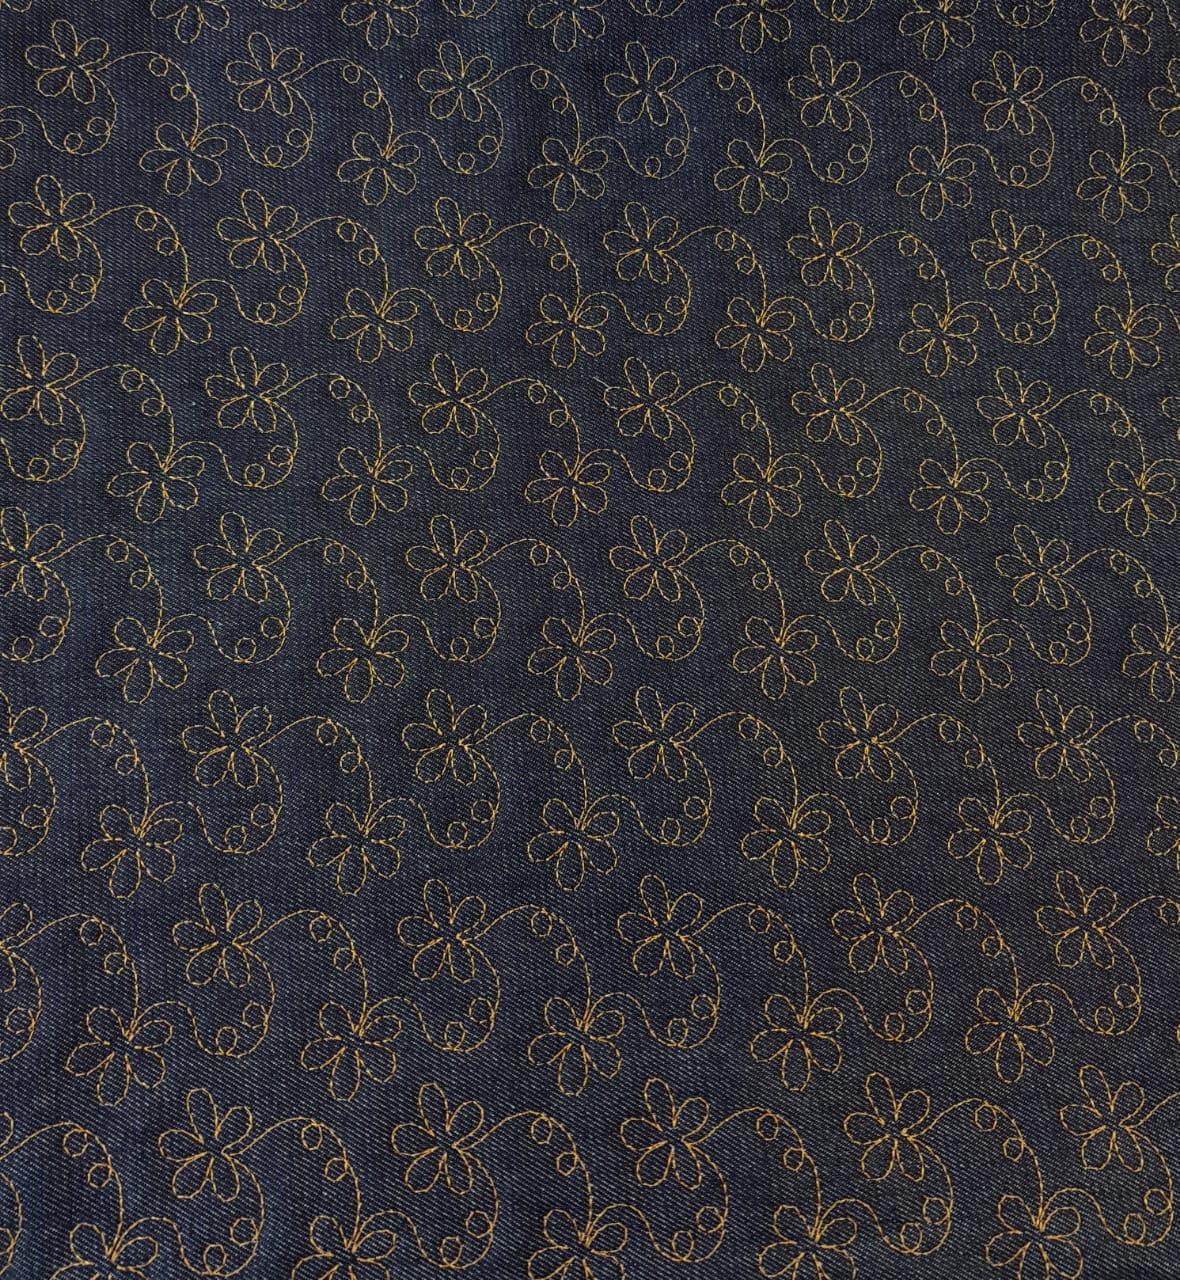 Jeans matelassado - flores miúdas - 0,50cm x 1,50m